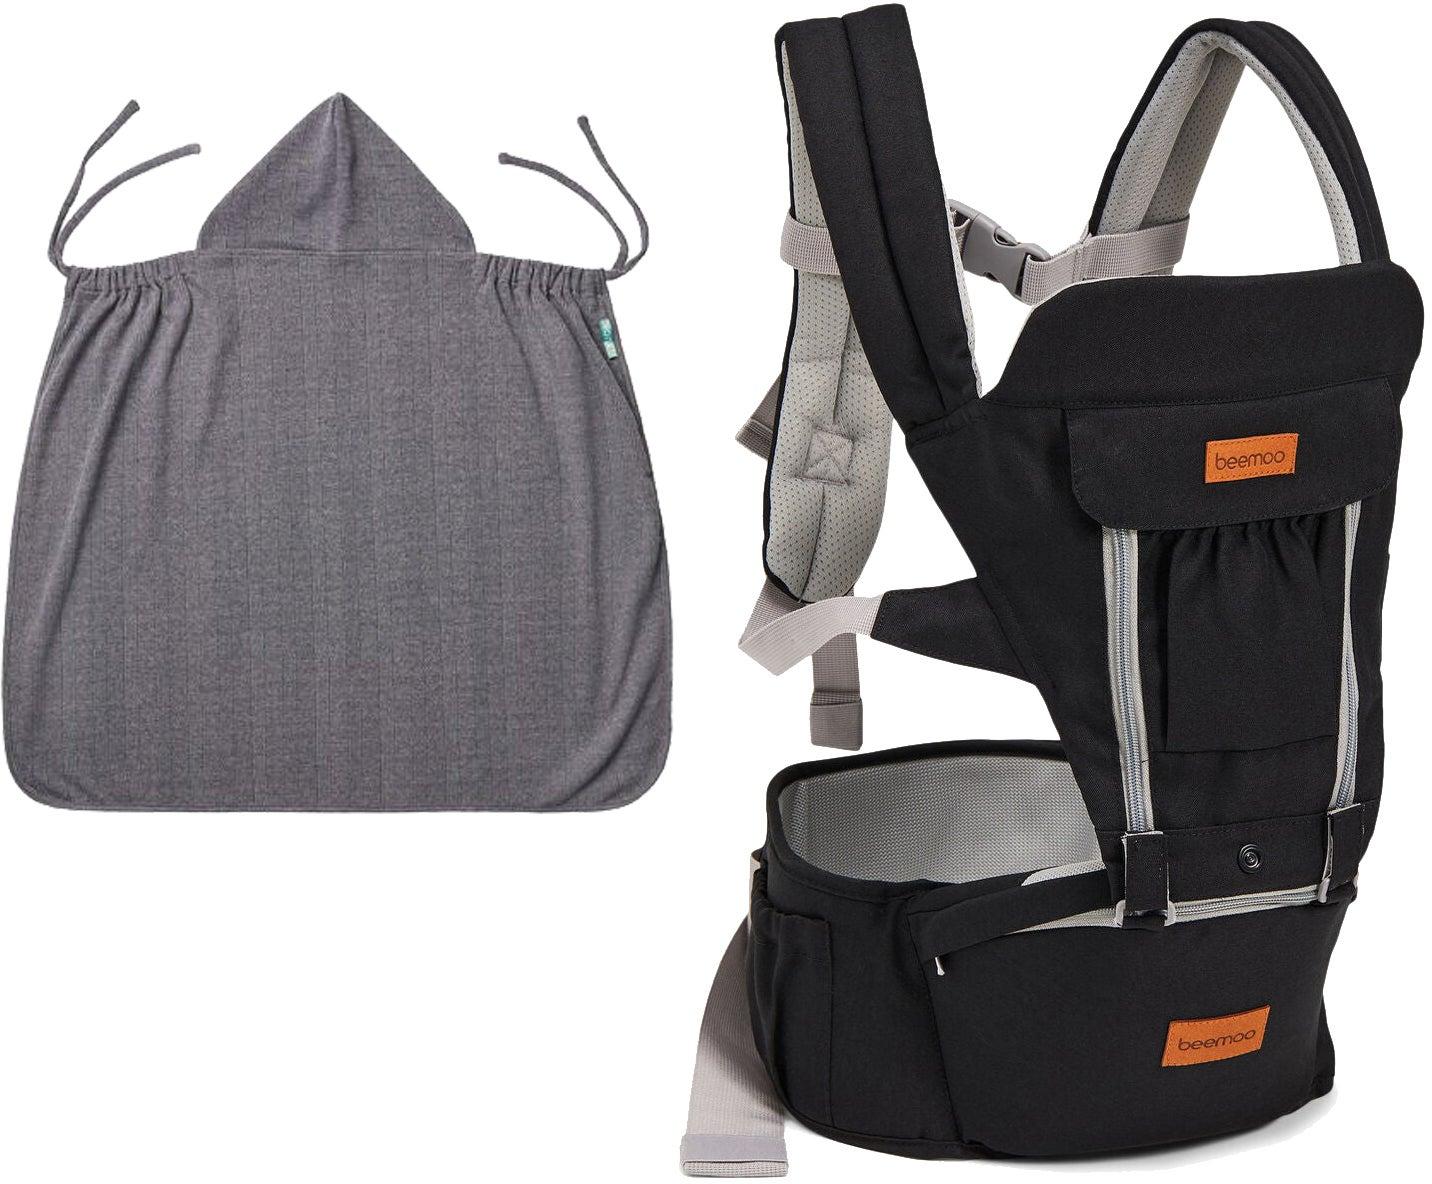 Beemoo Carry Comfort Adjust Bärsele inkl Överdrag, Black